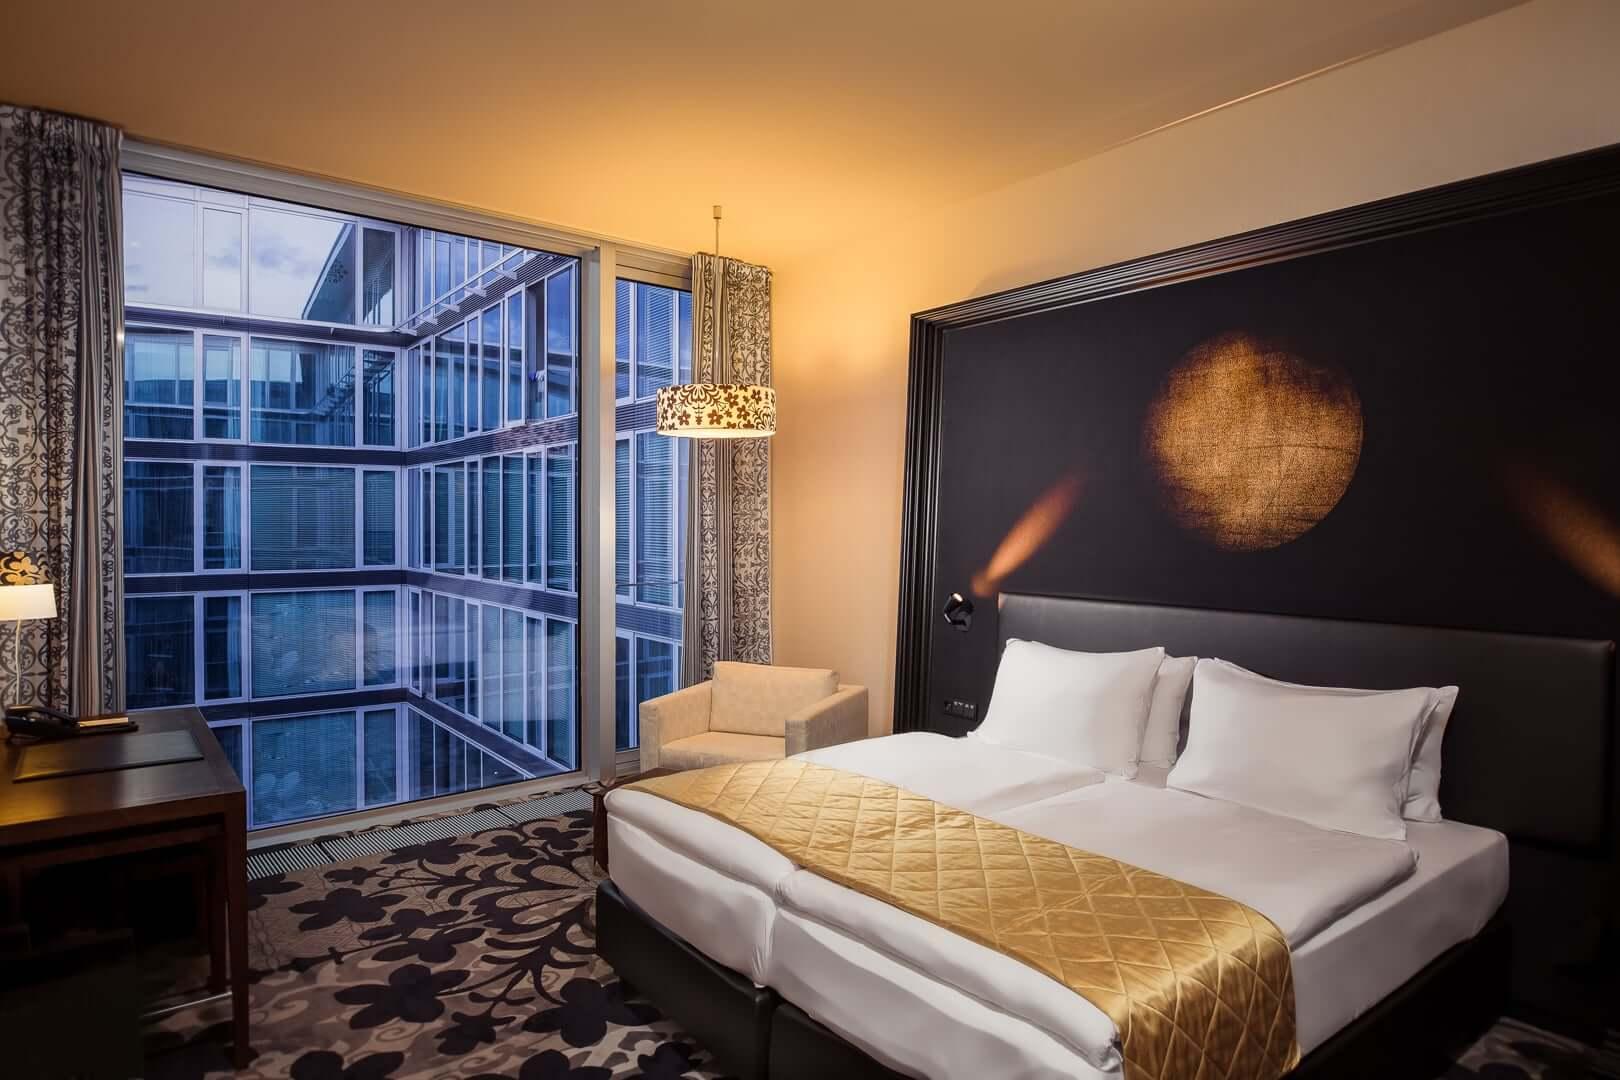 design hotel bonn premium zimmer kameha grand bonn. Black Bedroom Furniture Sets. Home Design Ideas